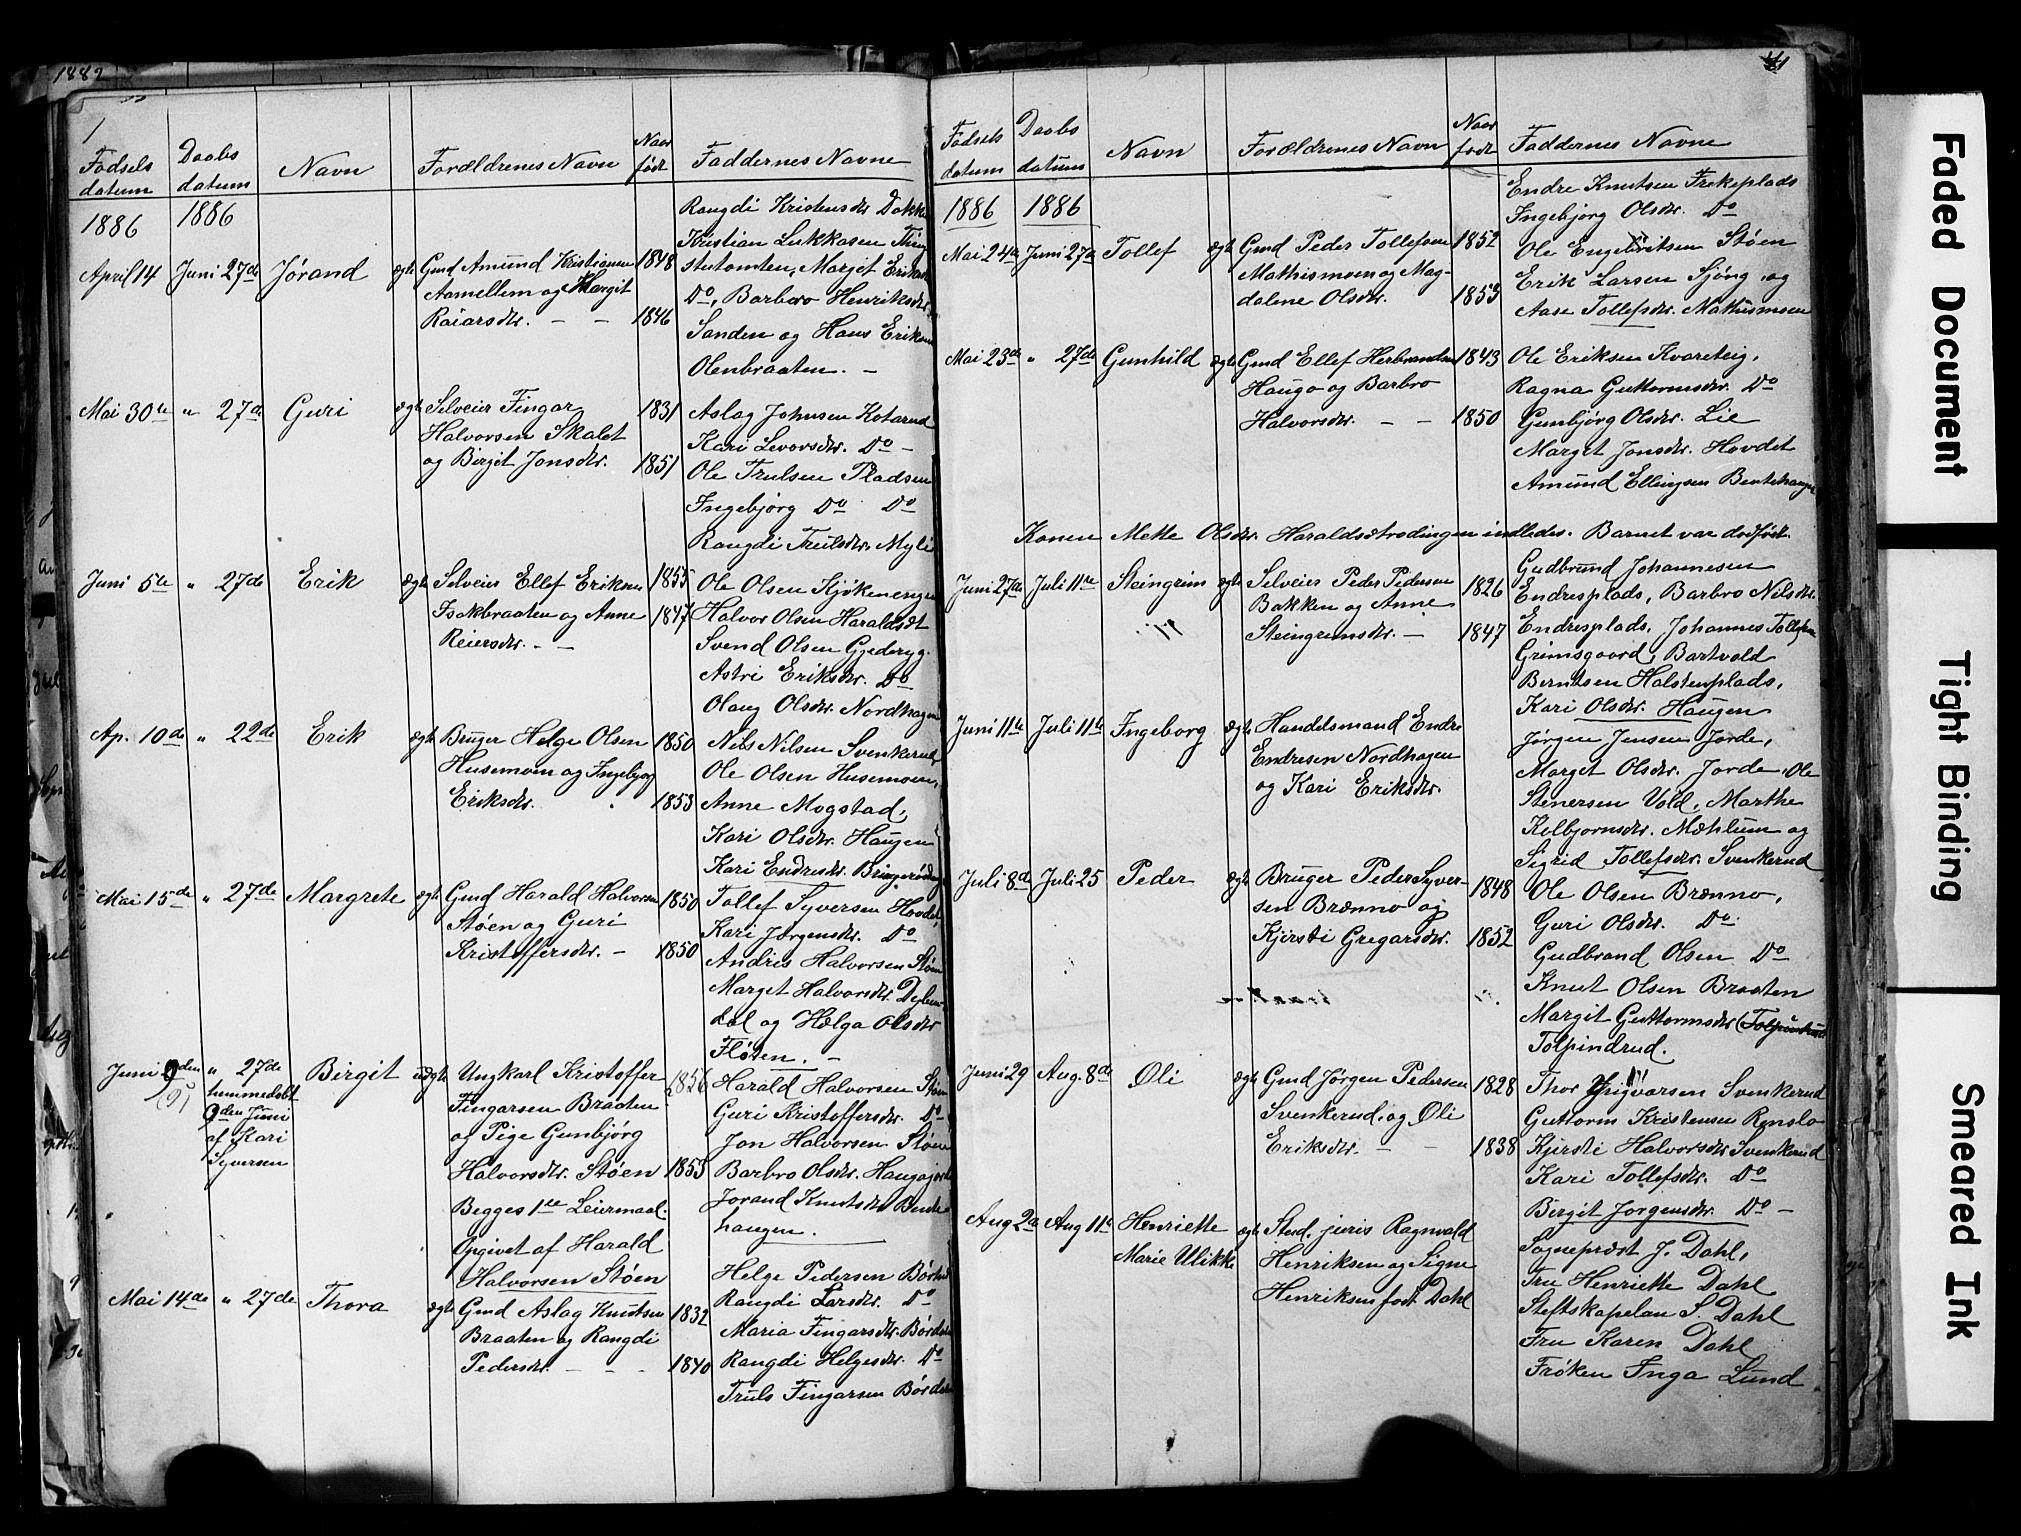 SAKO, Nes kirkebøker, G/Ga/L0002: Klokkerbok nr. I 2, 1872-1912, s. 41